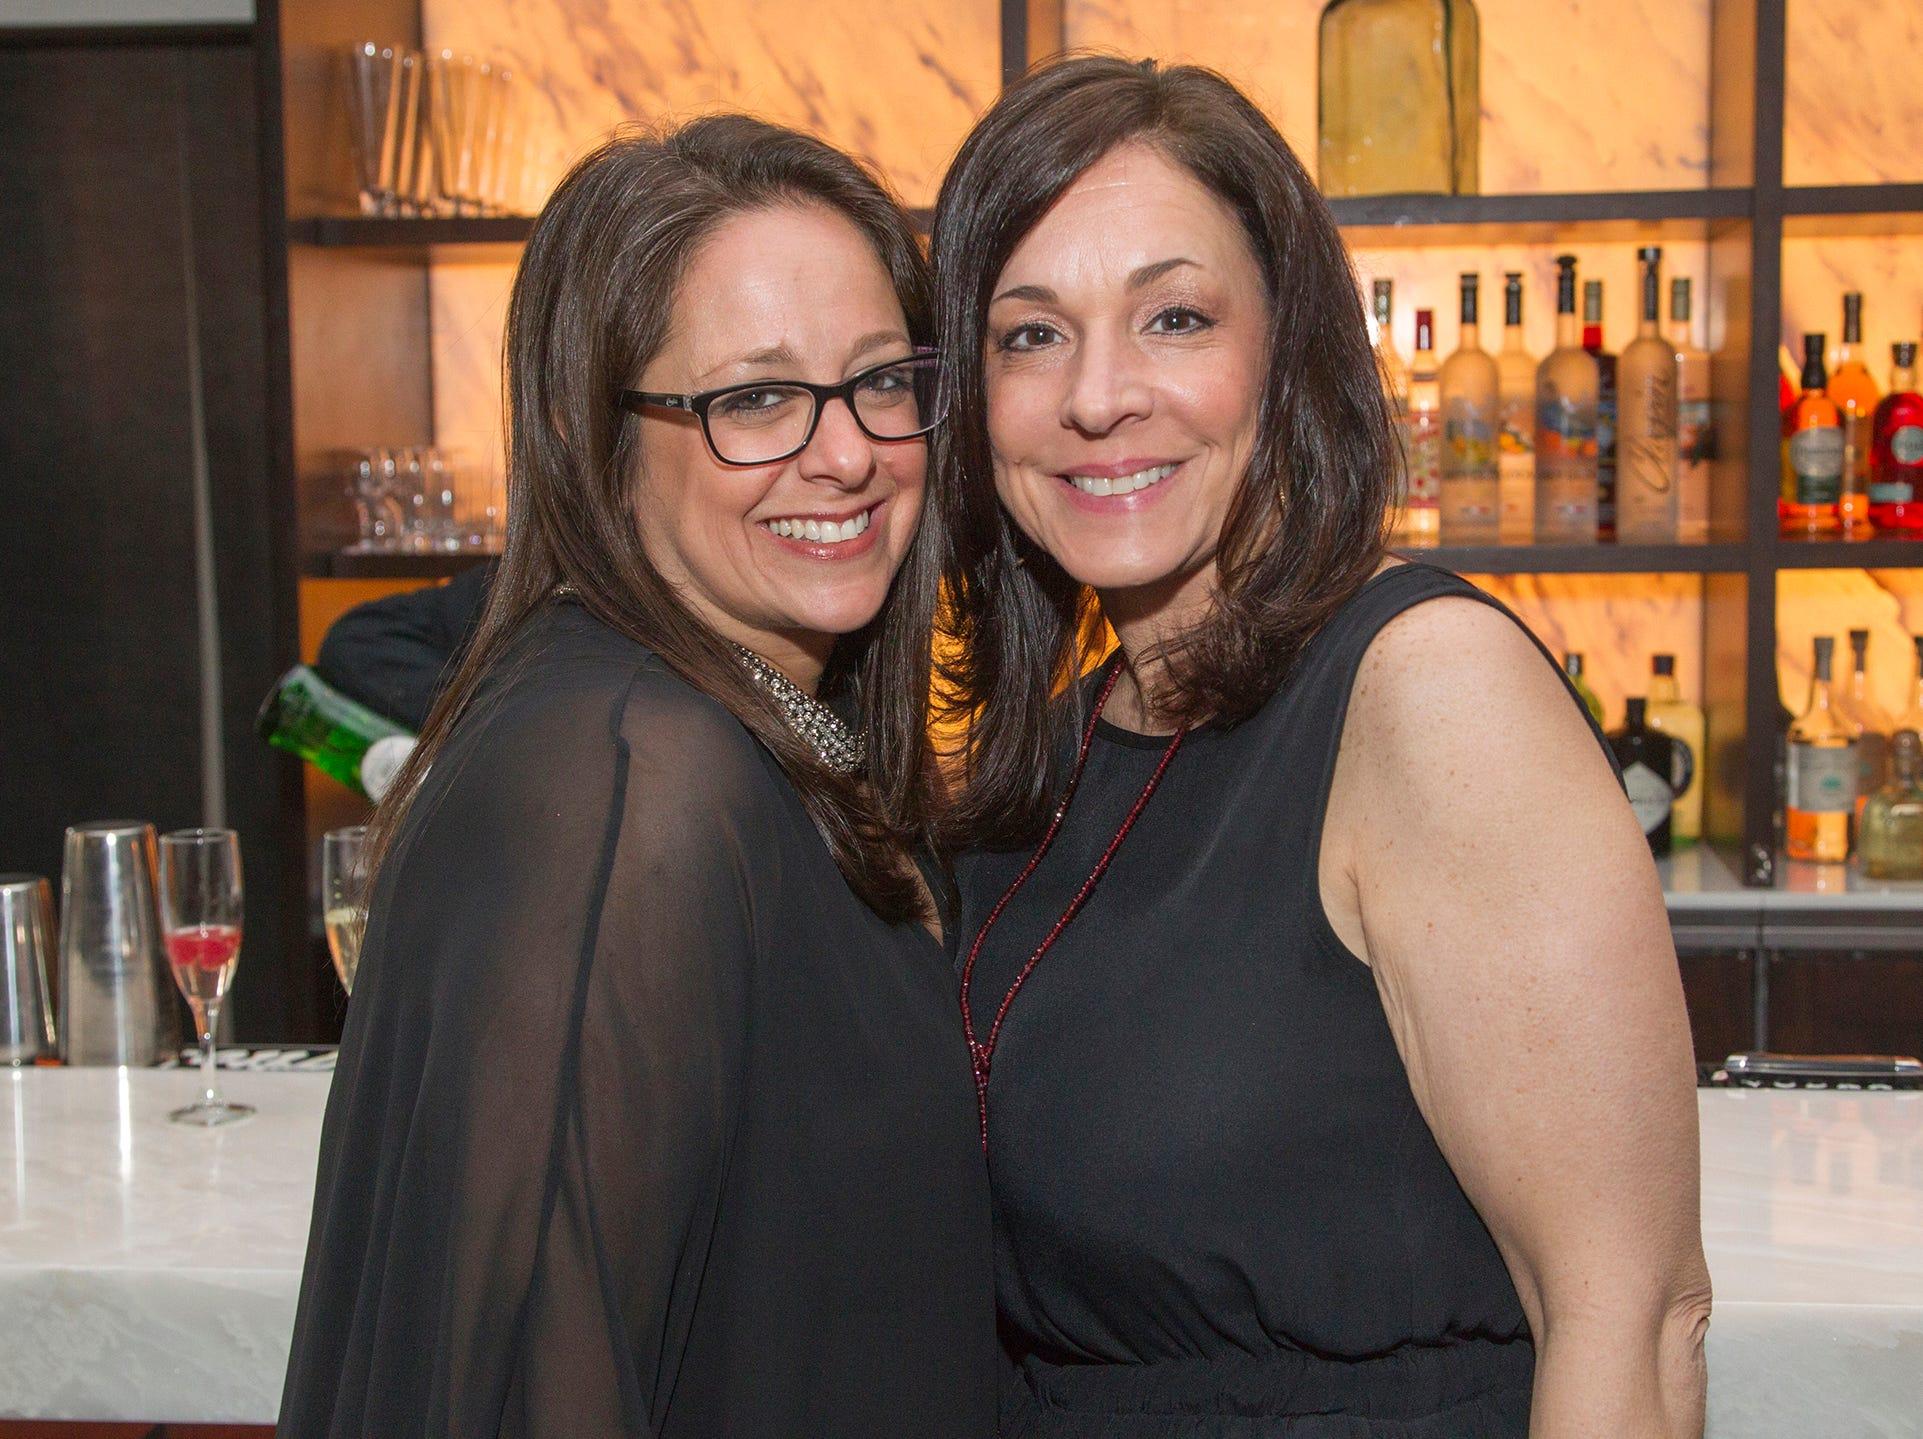 Stephanie Janirr, Debbie Eliopoulos. Saddle River Day Annual Gala at Alpine Country Club 04/13/2019